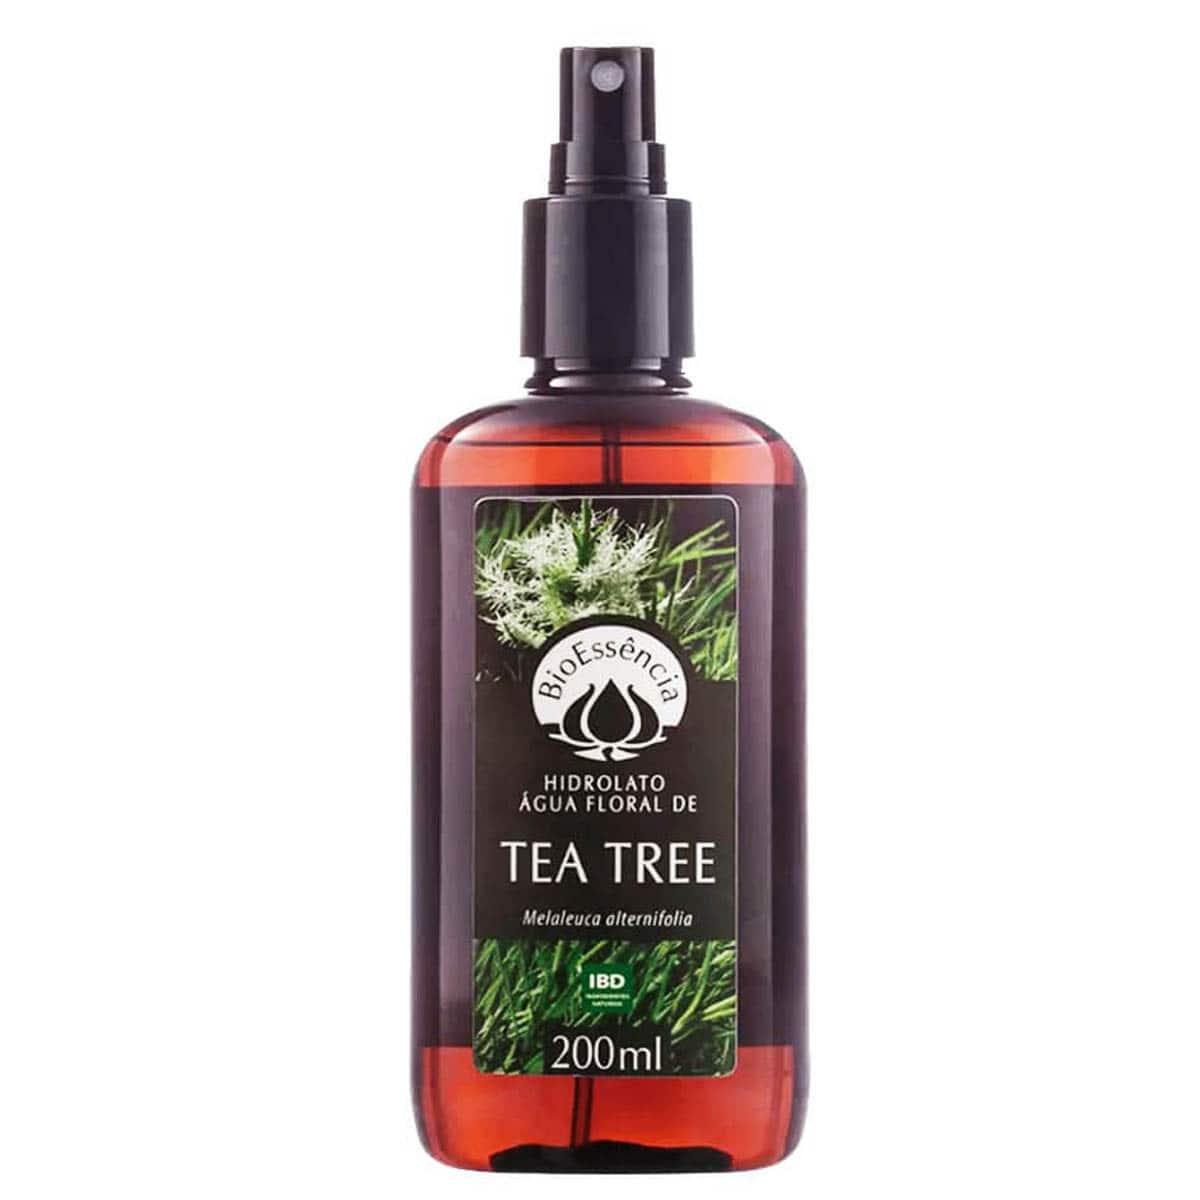 Hidrolato água floral de tea tree 200ml  - Bioessência